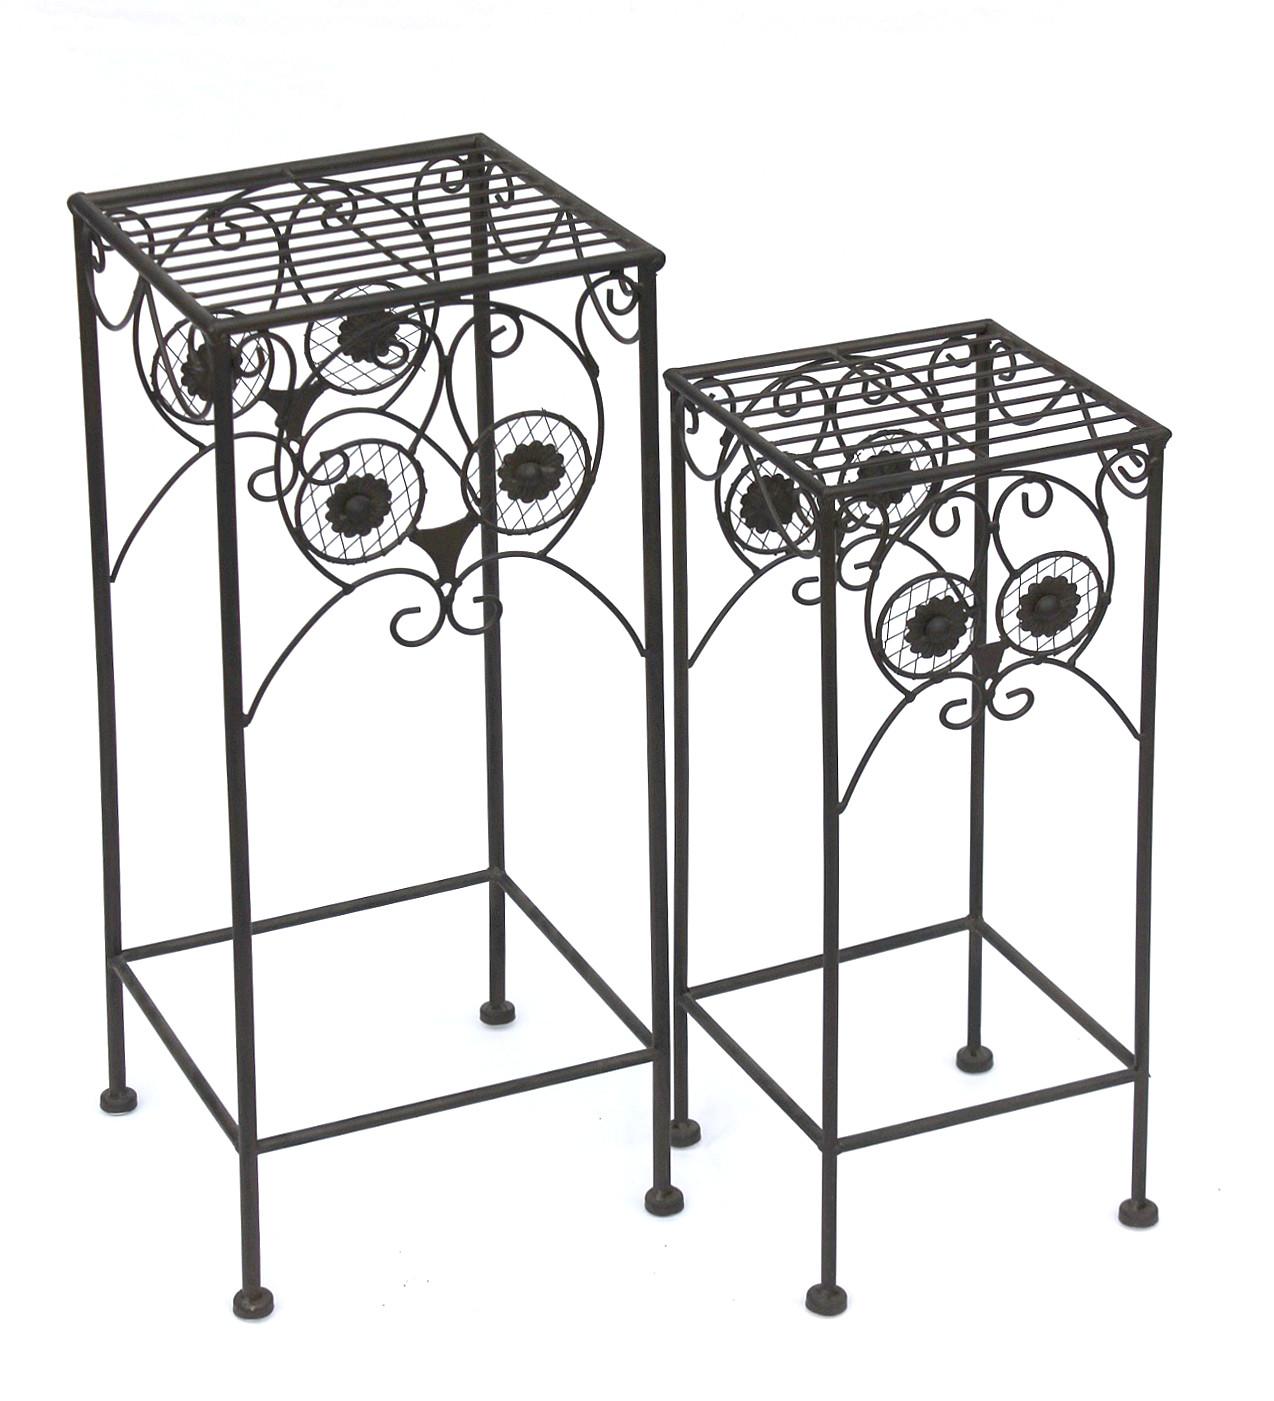 blumenhocker metall eule 140193 2er set blumenst nder pflanzenst nder hocker 4260407935145 ebay. Black Bedroom Furniture Sets. Home Design Ideas